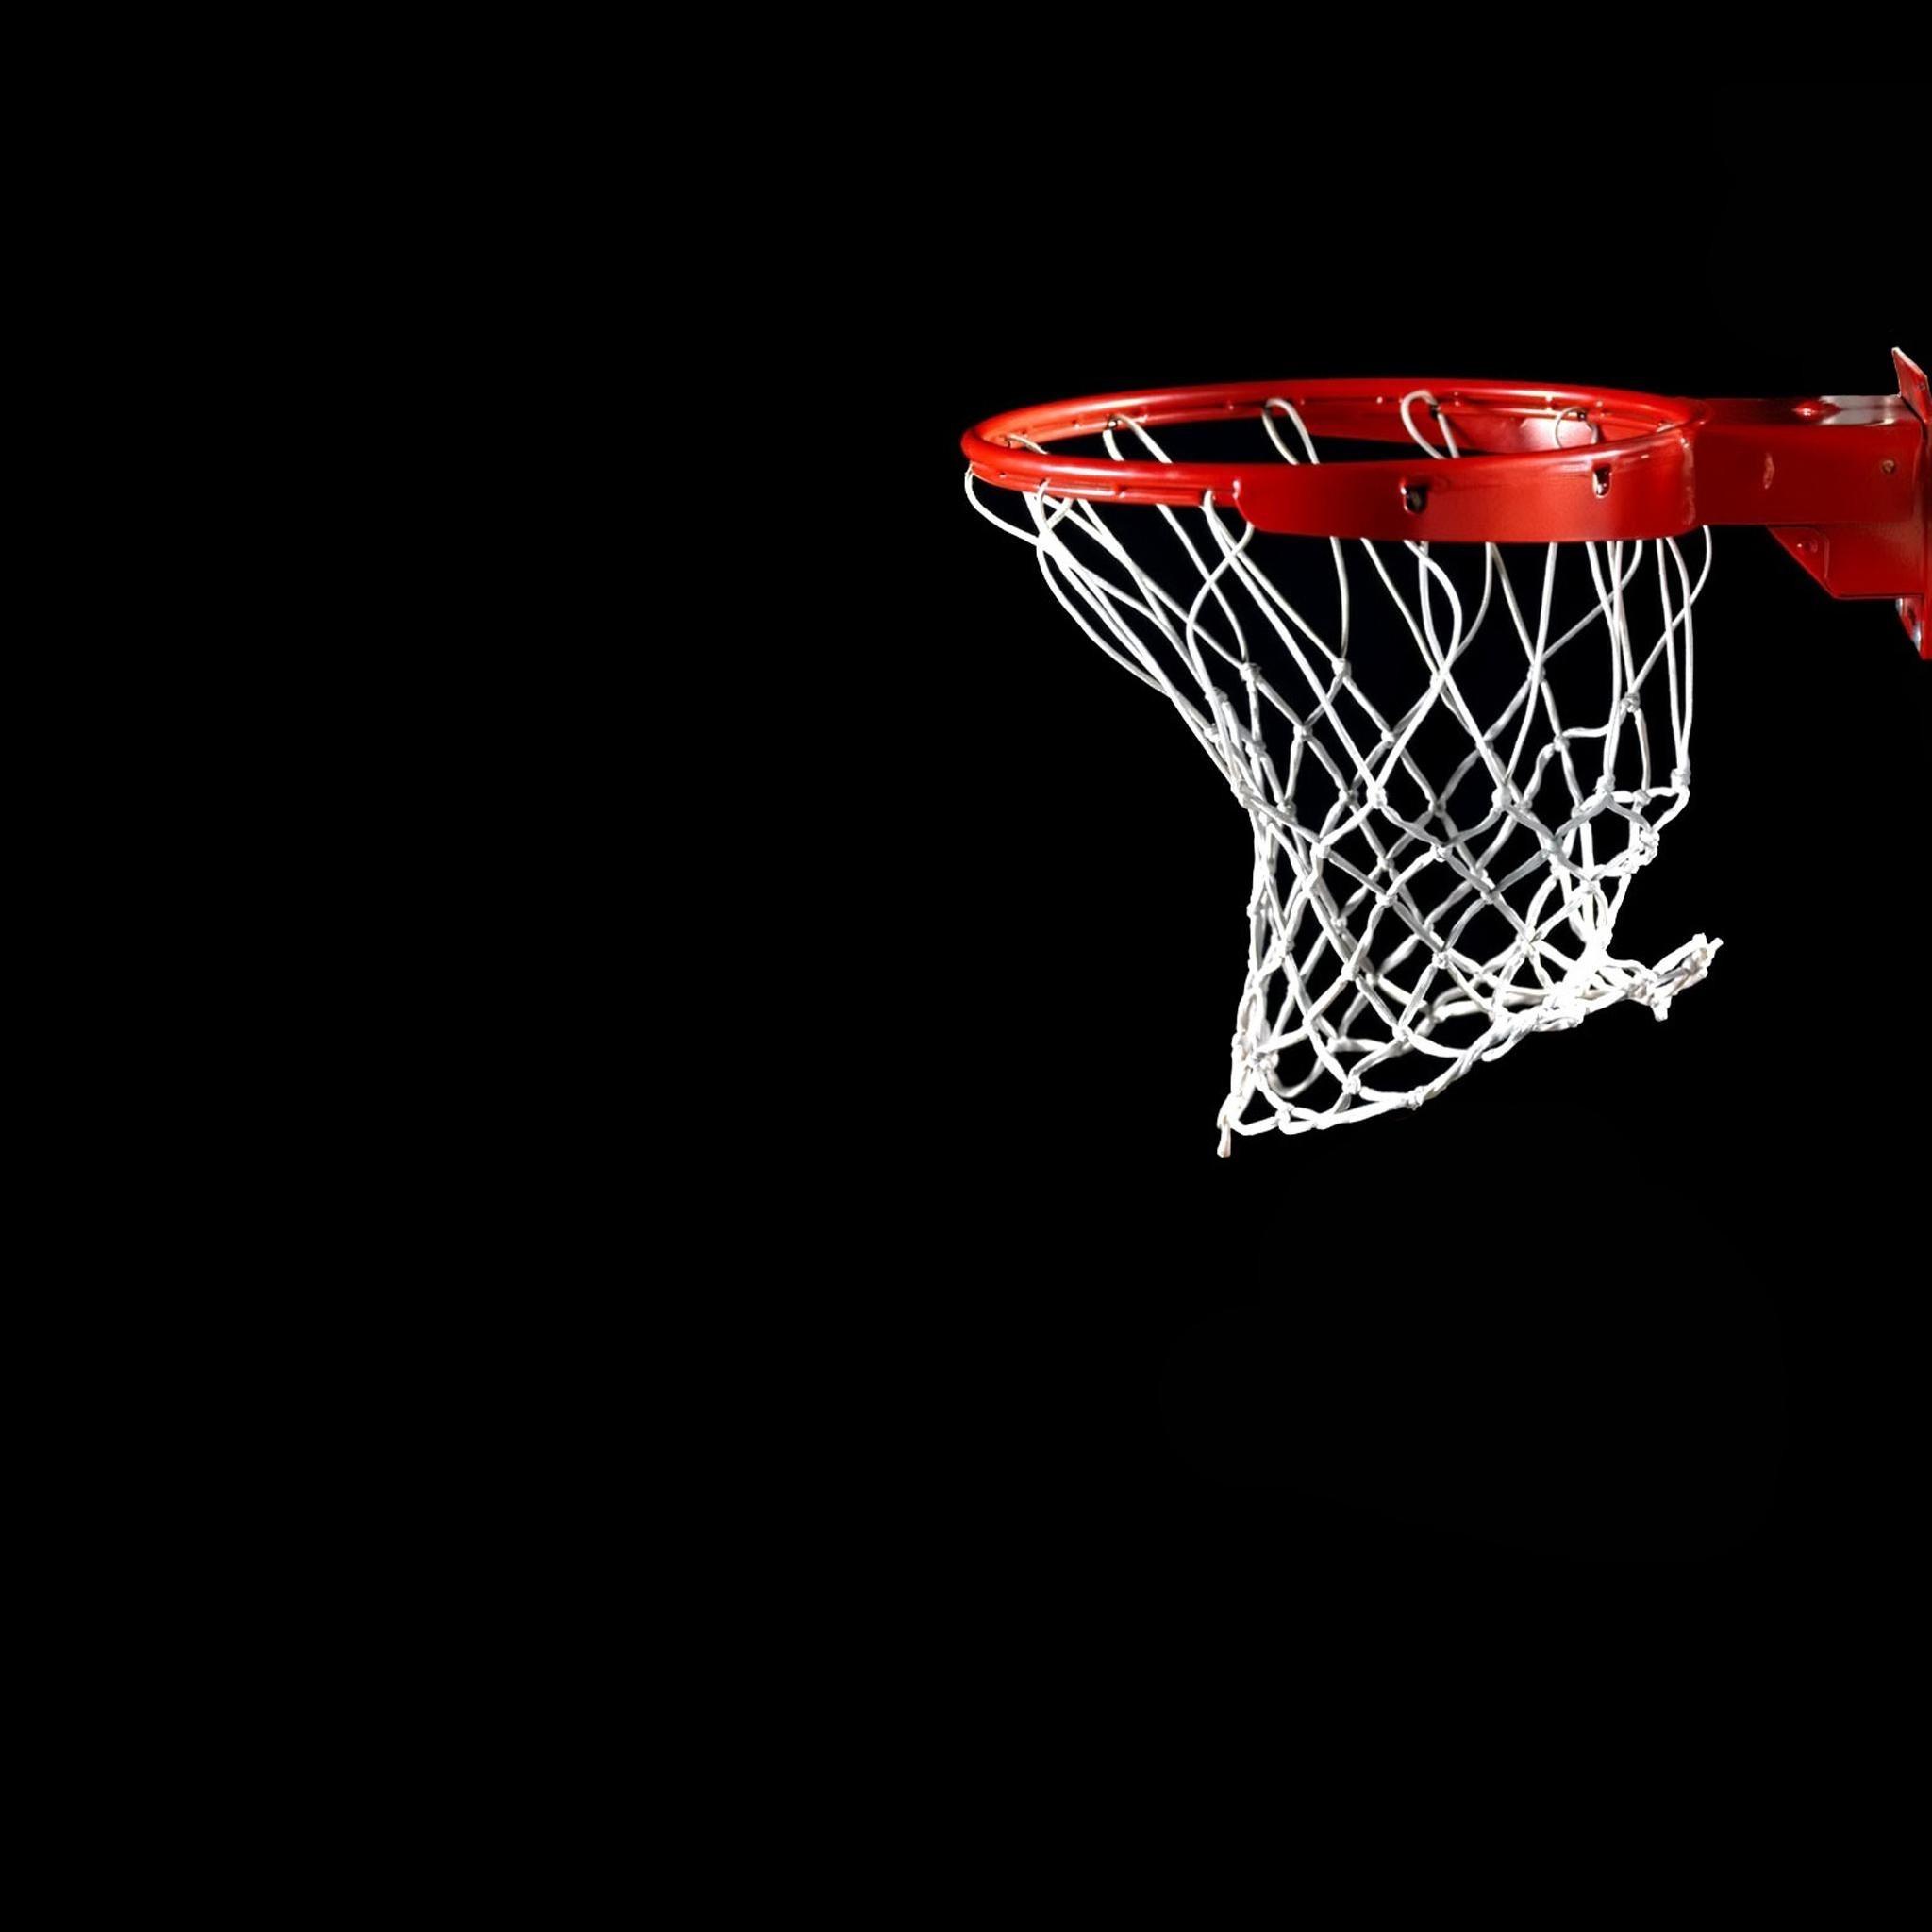 Logo NBA Wallpapers ·① WallpaperTag